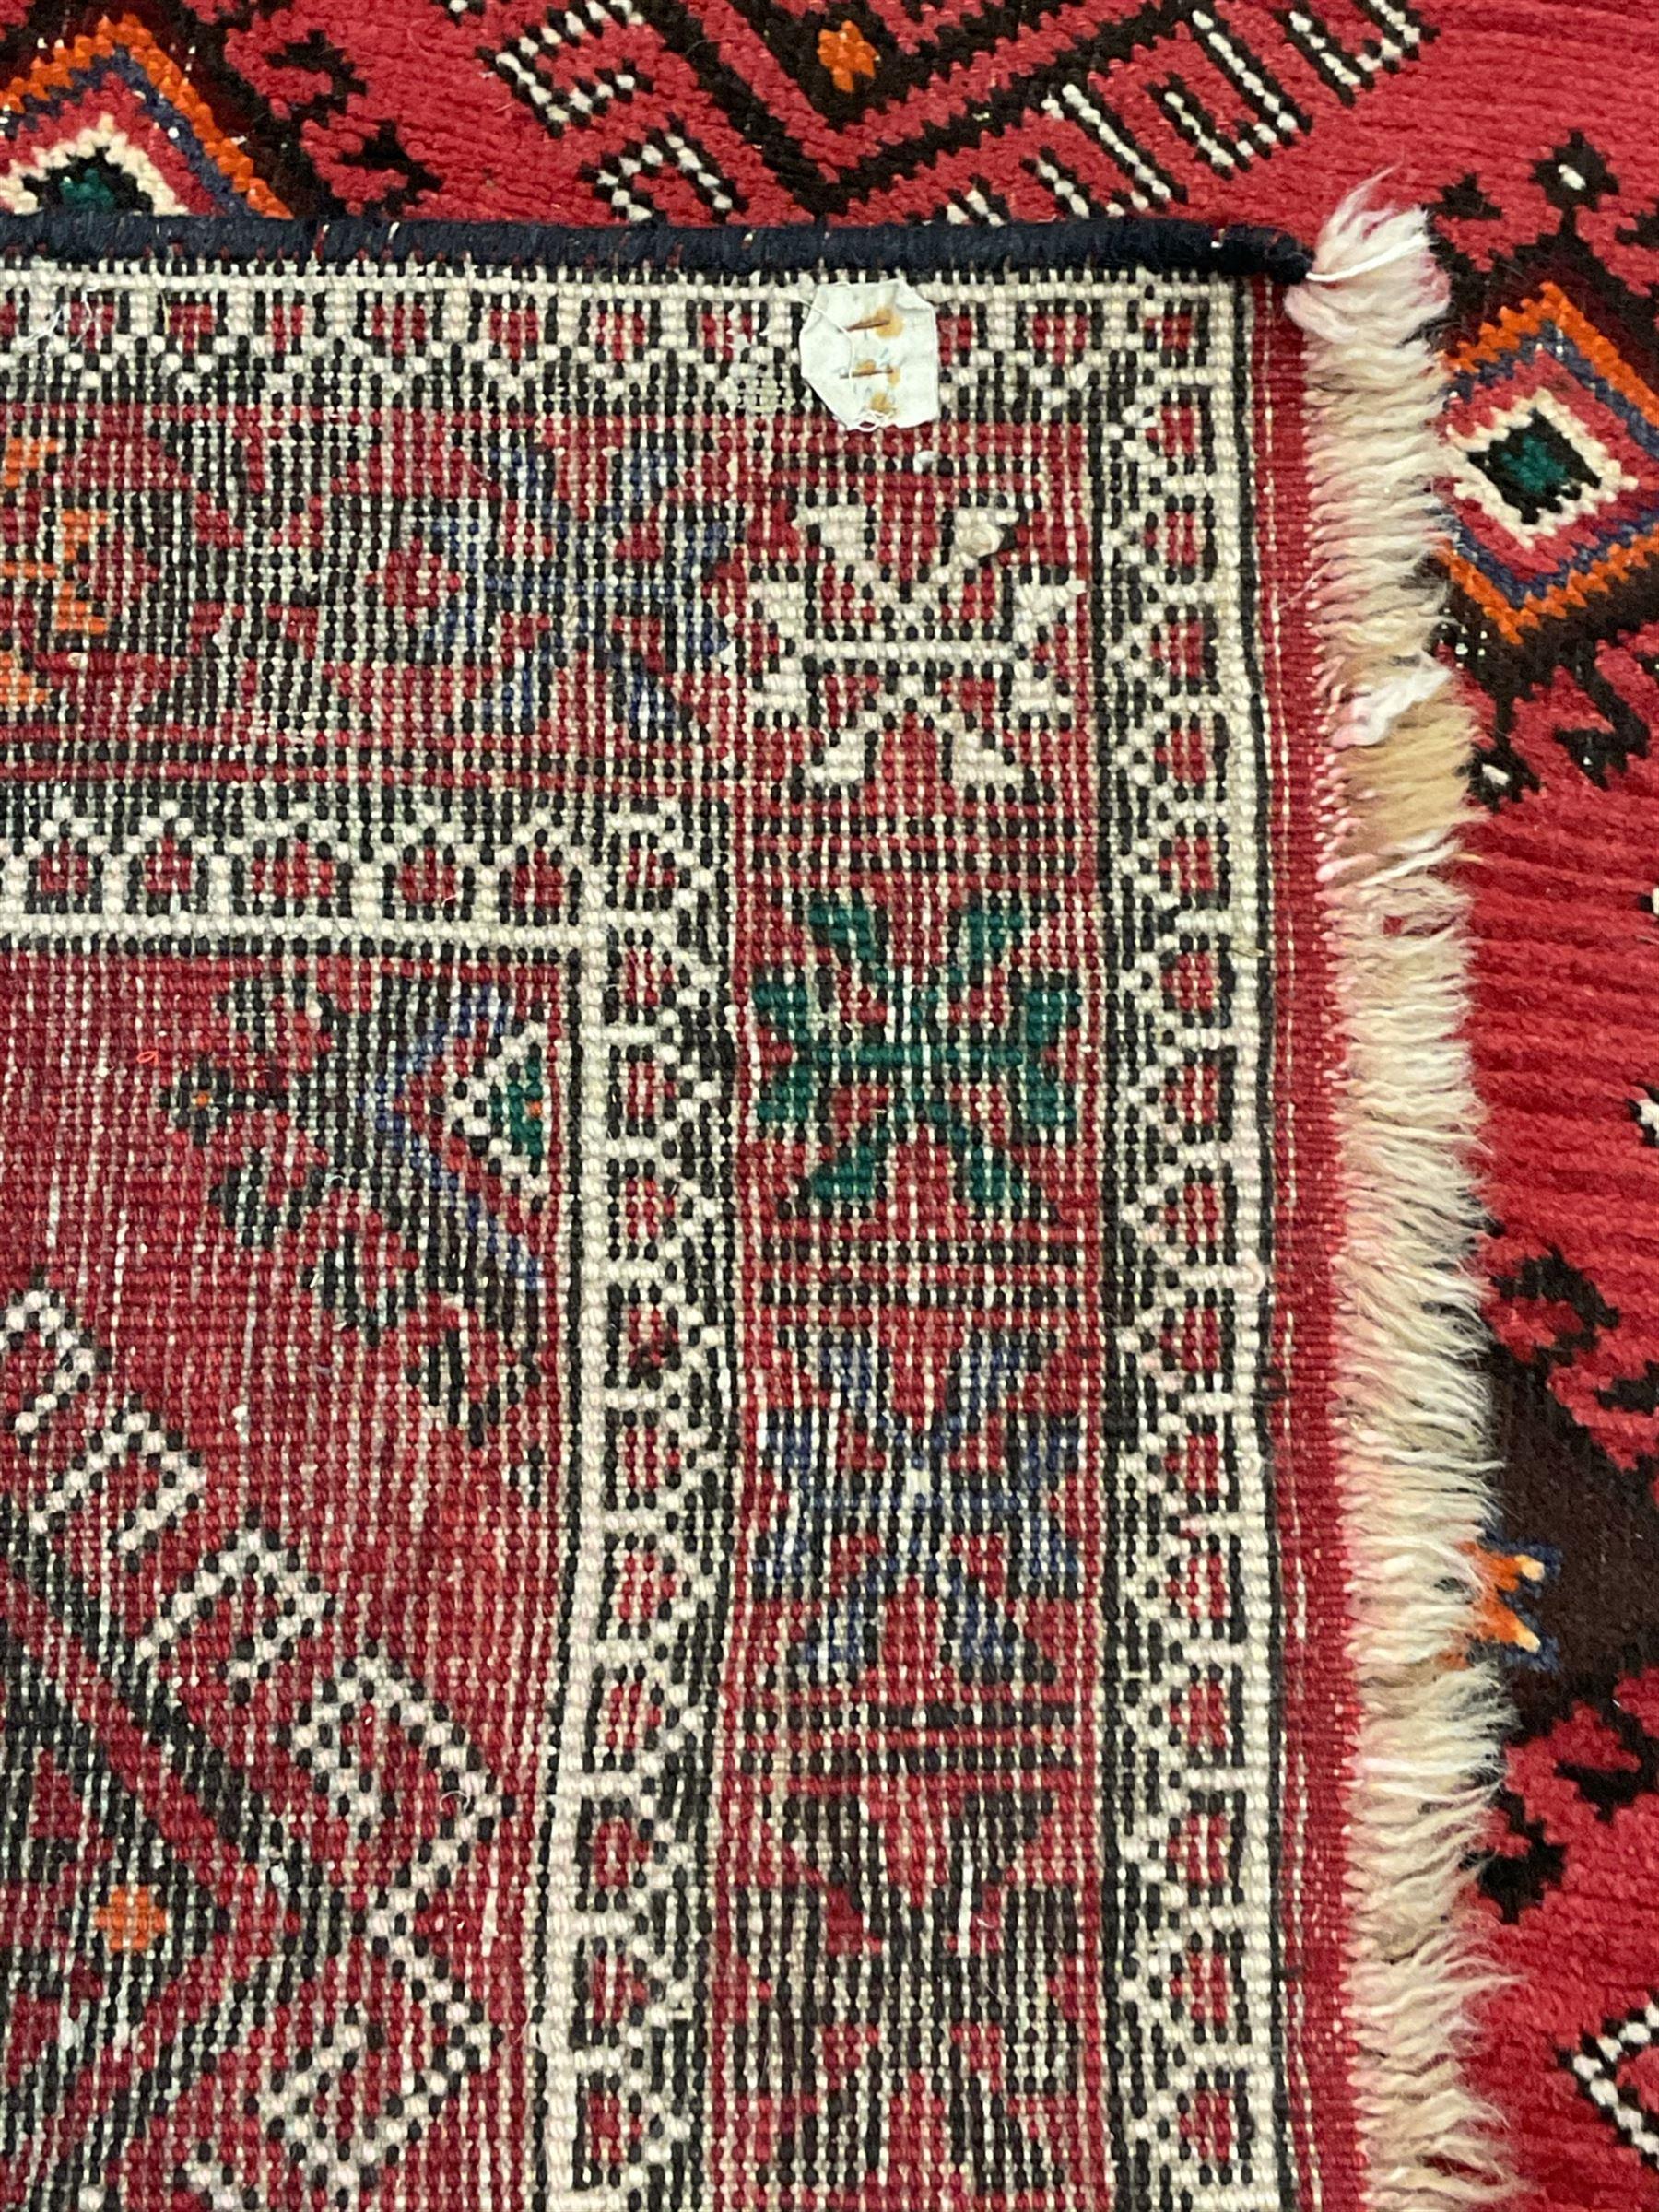 Turkish red ground rug - Image 4 of 4